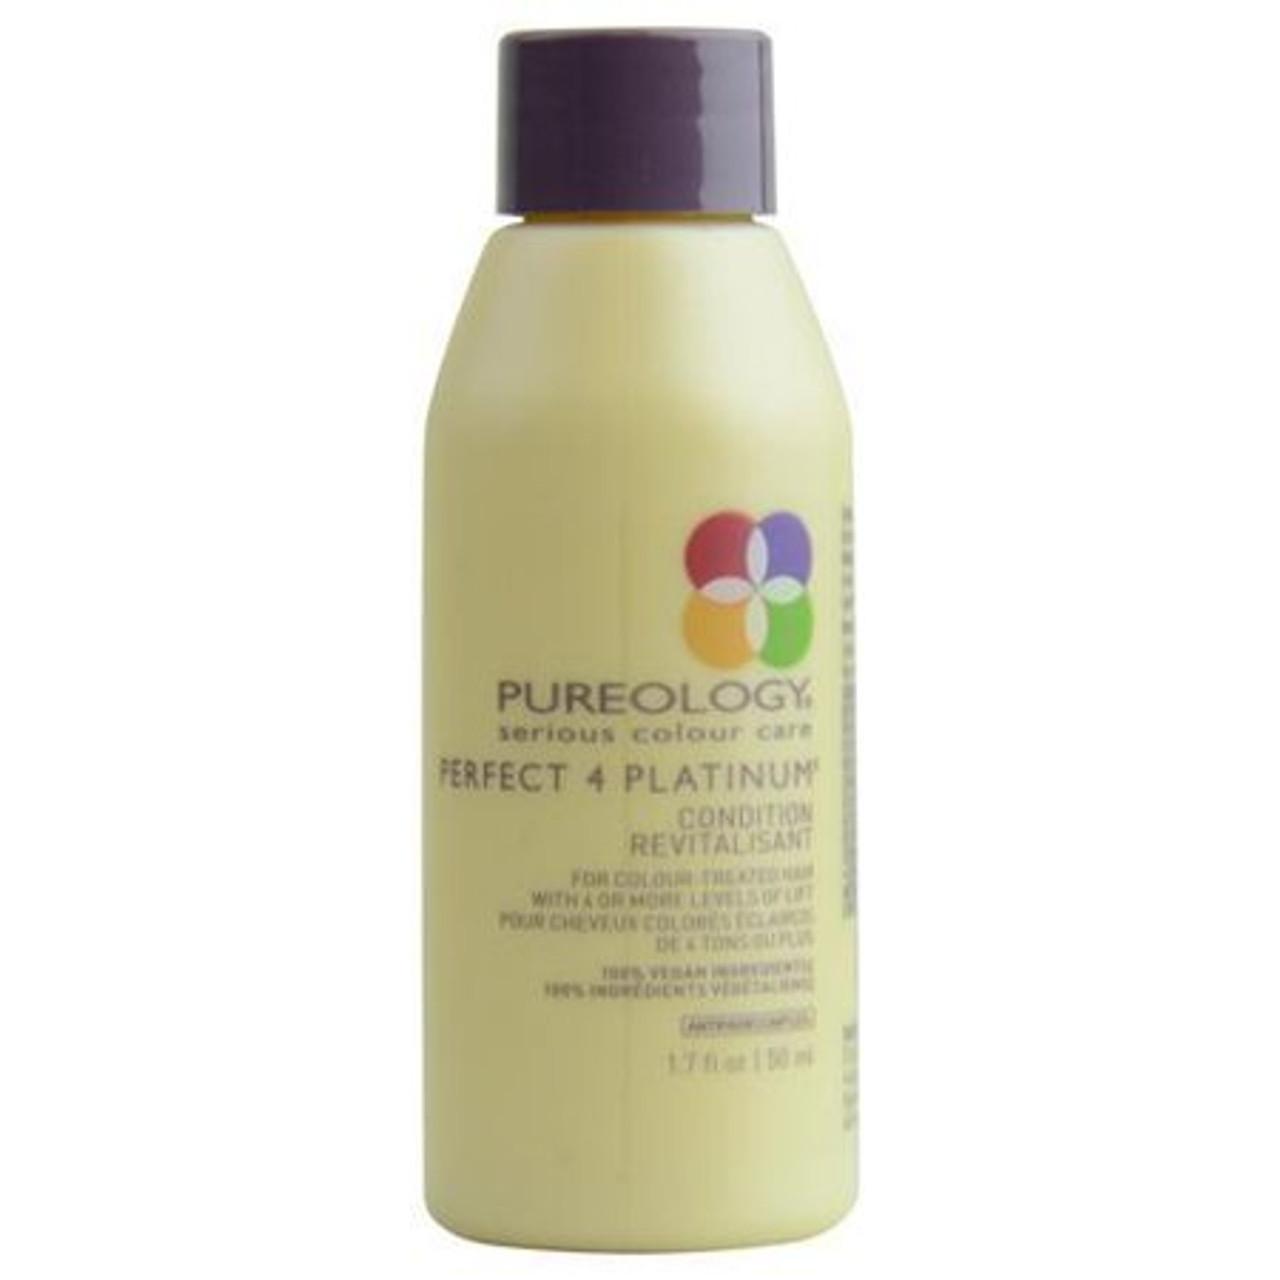 Pureology Perfect 4 Platinum Condition 1.7 oz